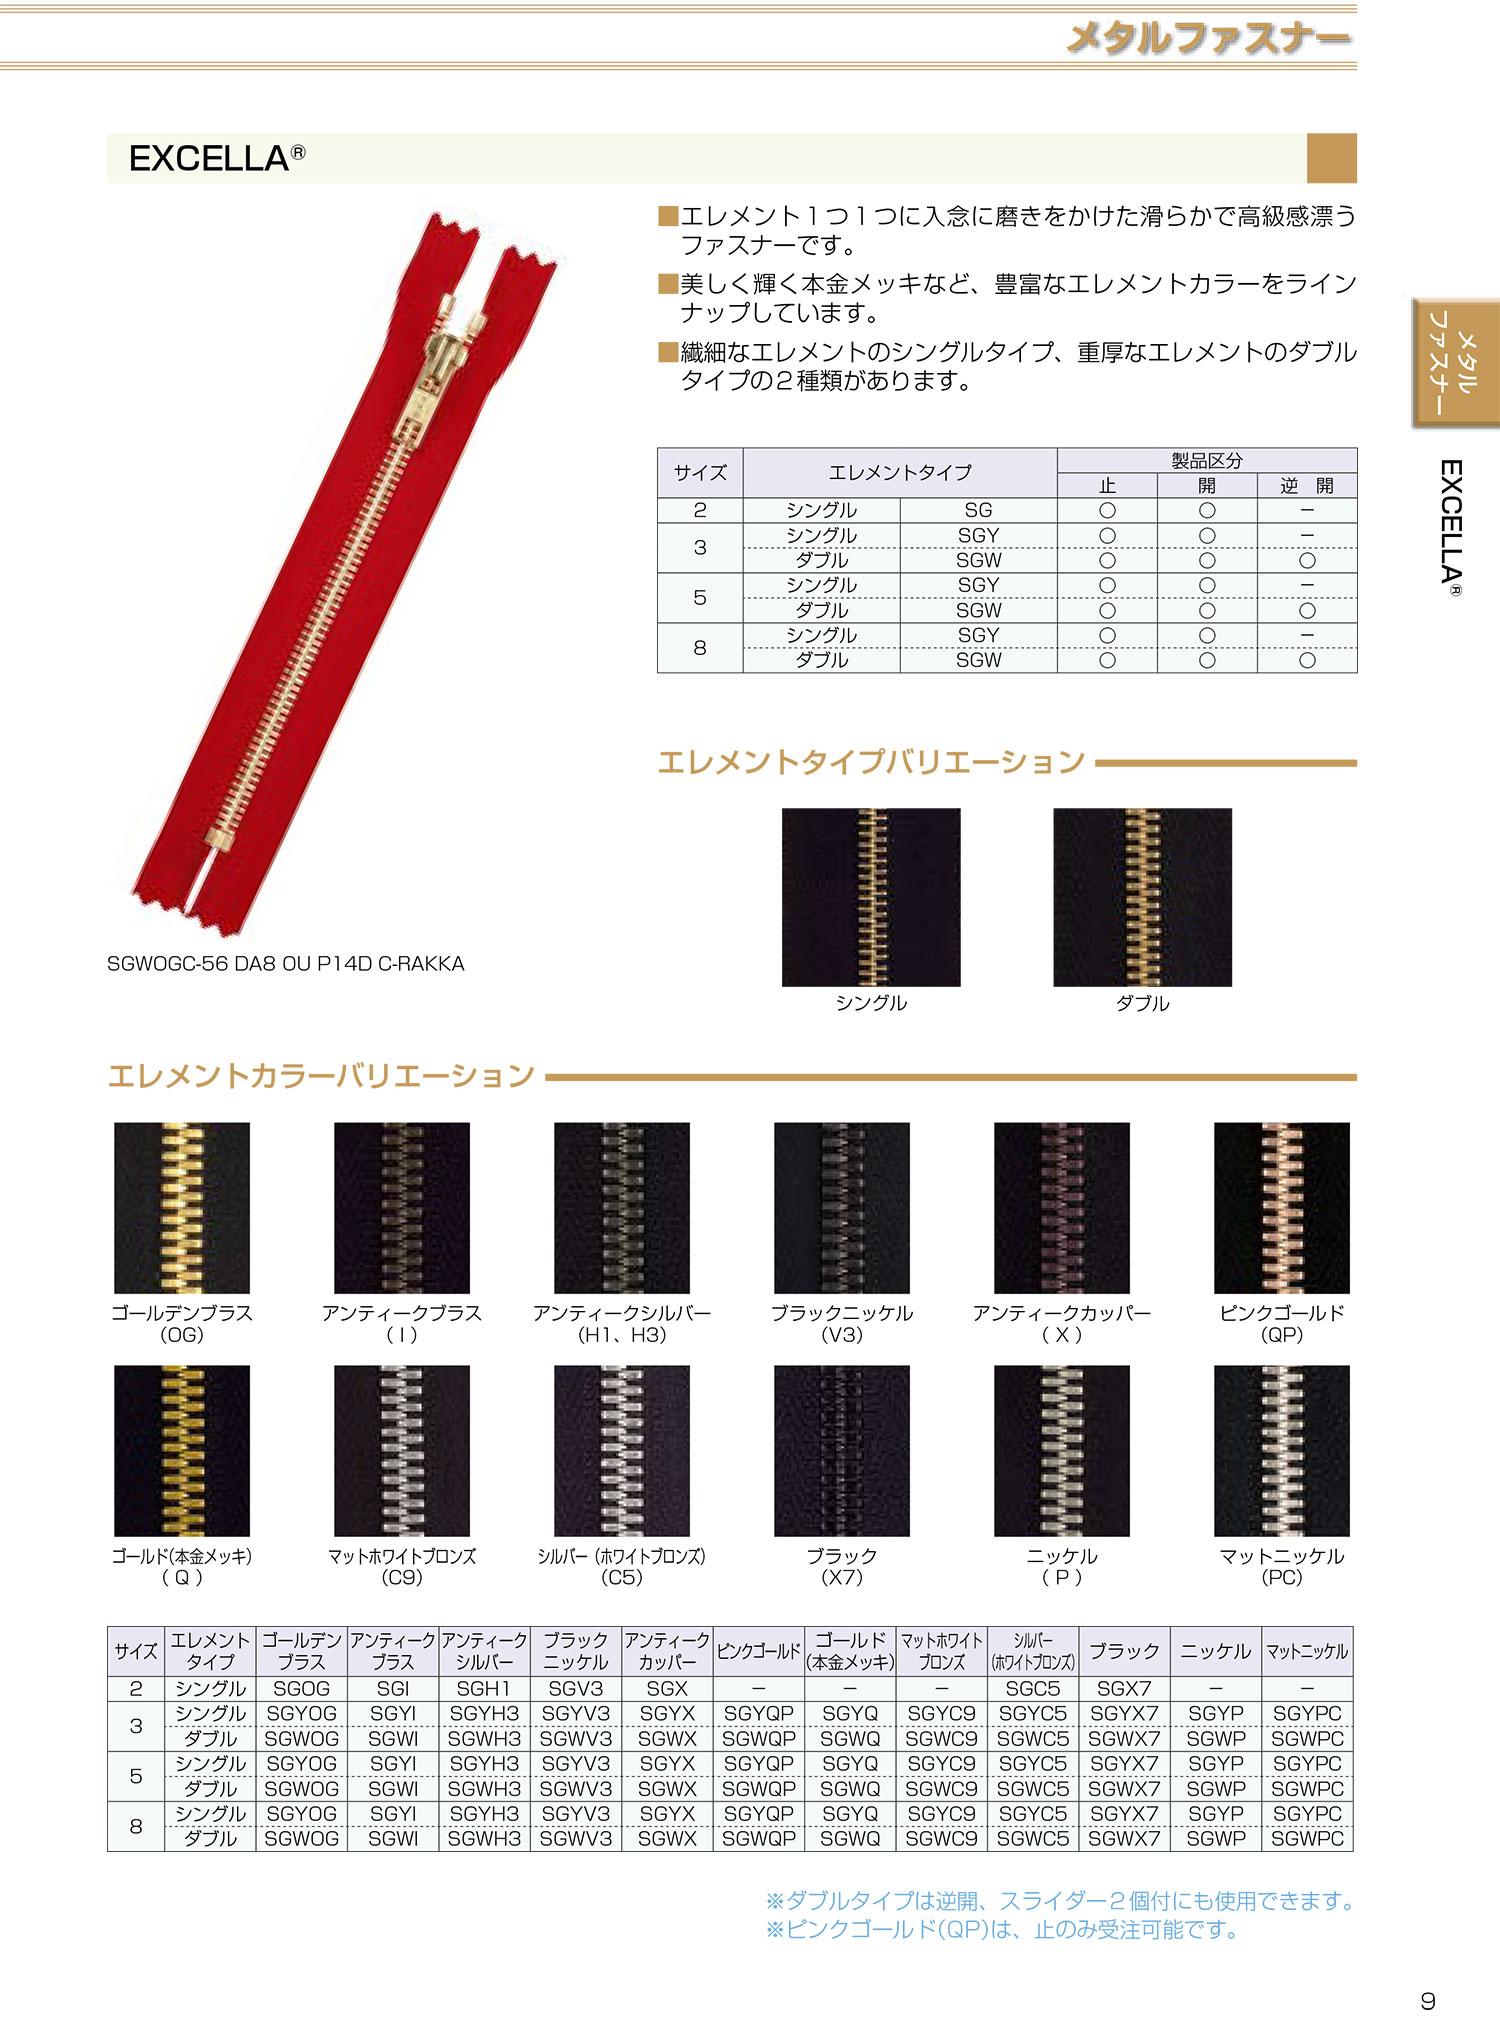 5SGWX7MR エクセラ 5サイズ ブラック 逆開 ダブル[ファスナー] YKK/オークラ商事 - ApparelX アパレル資材卸通販